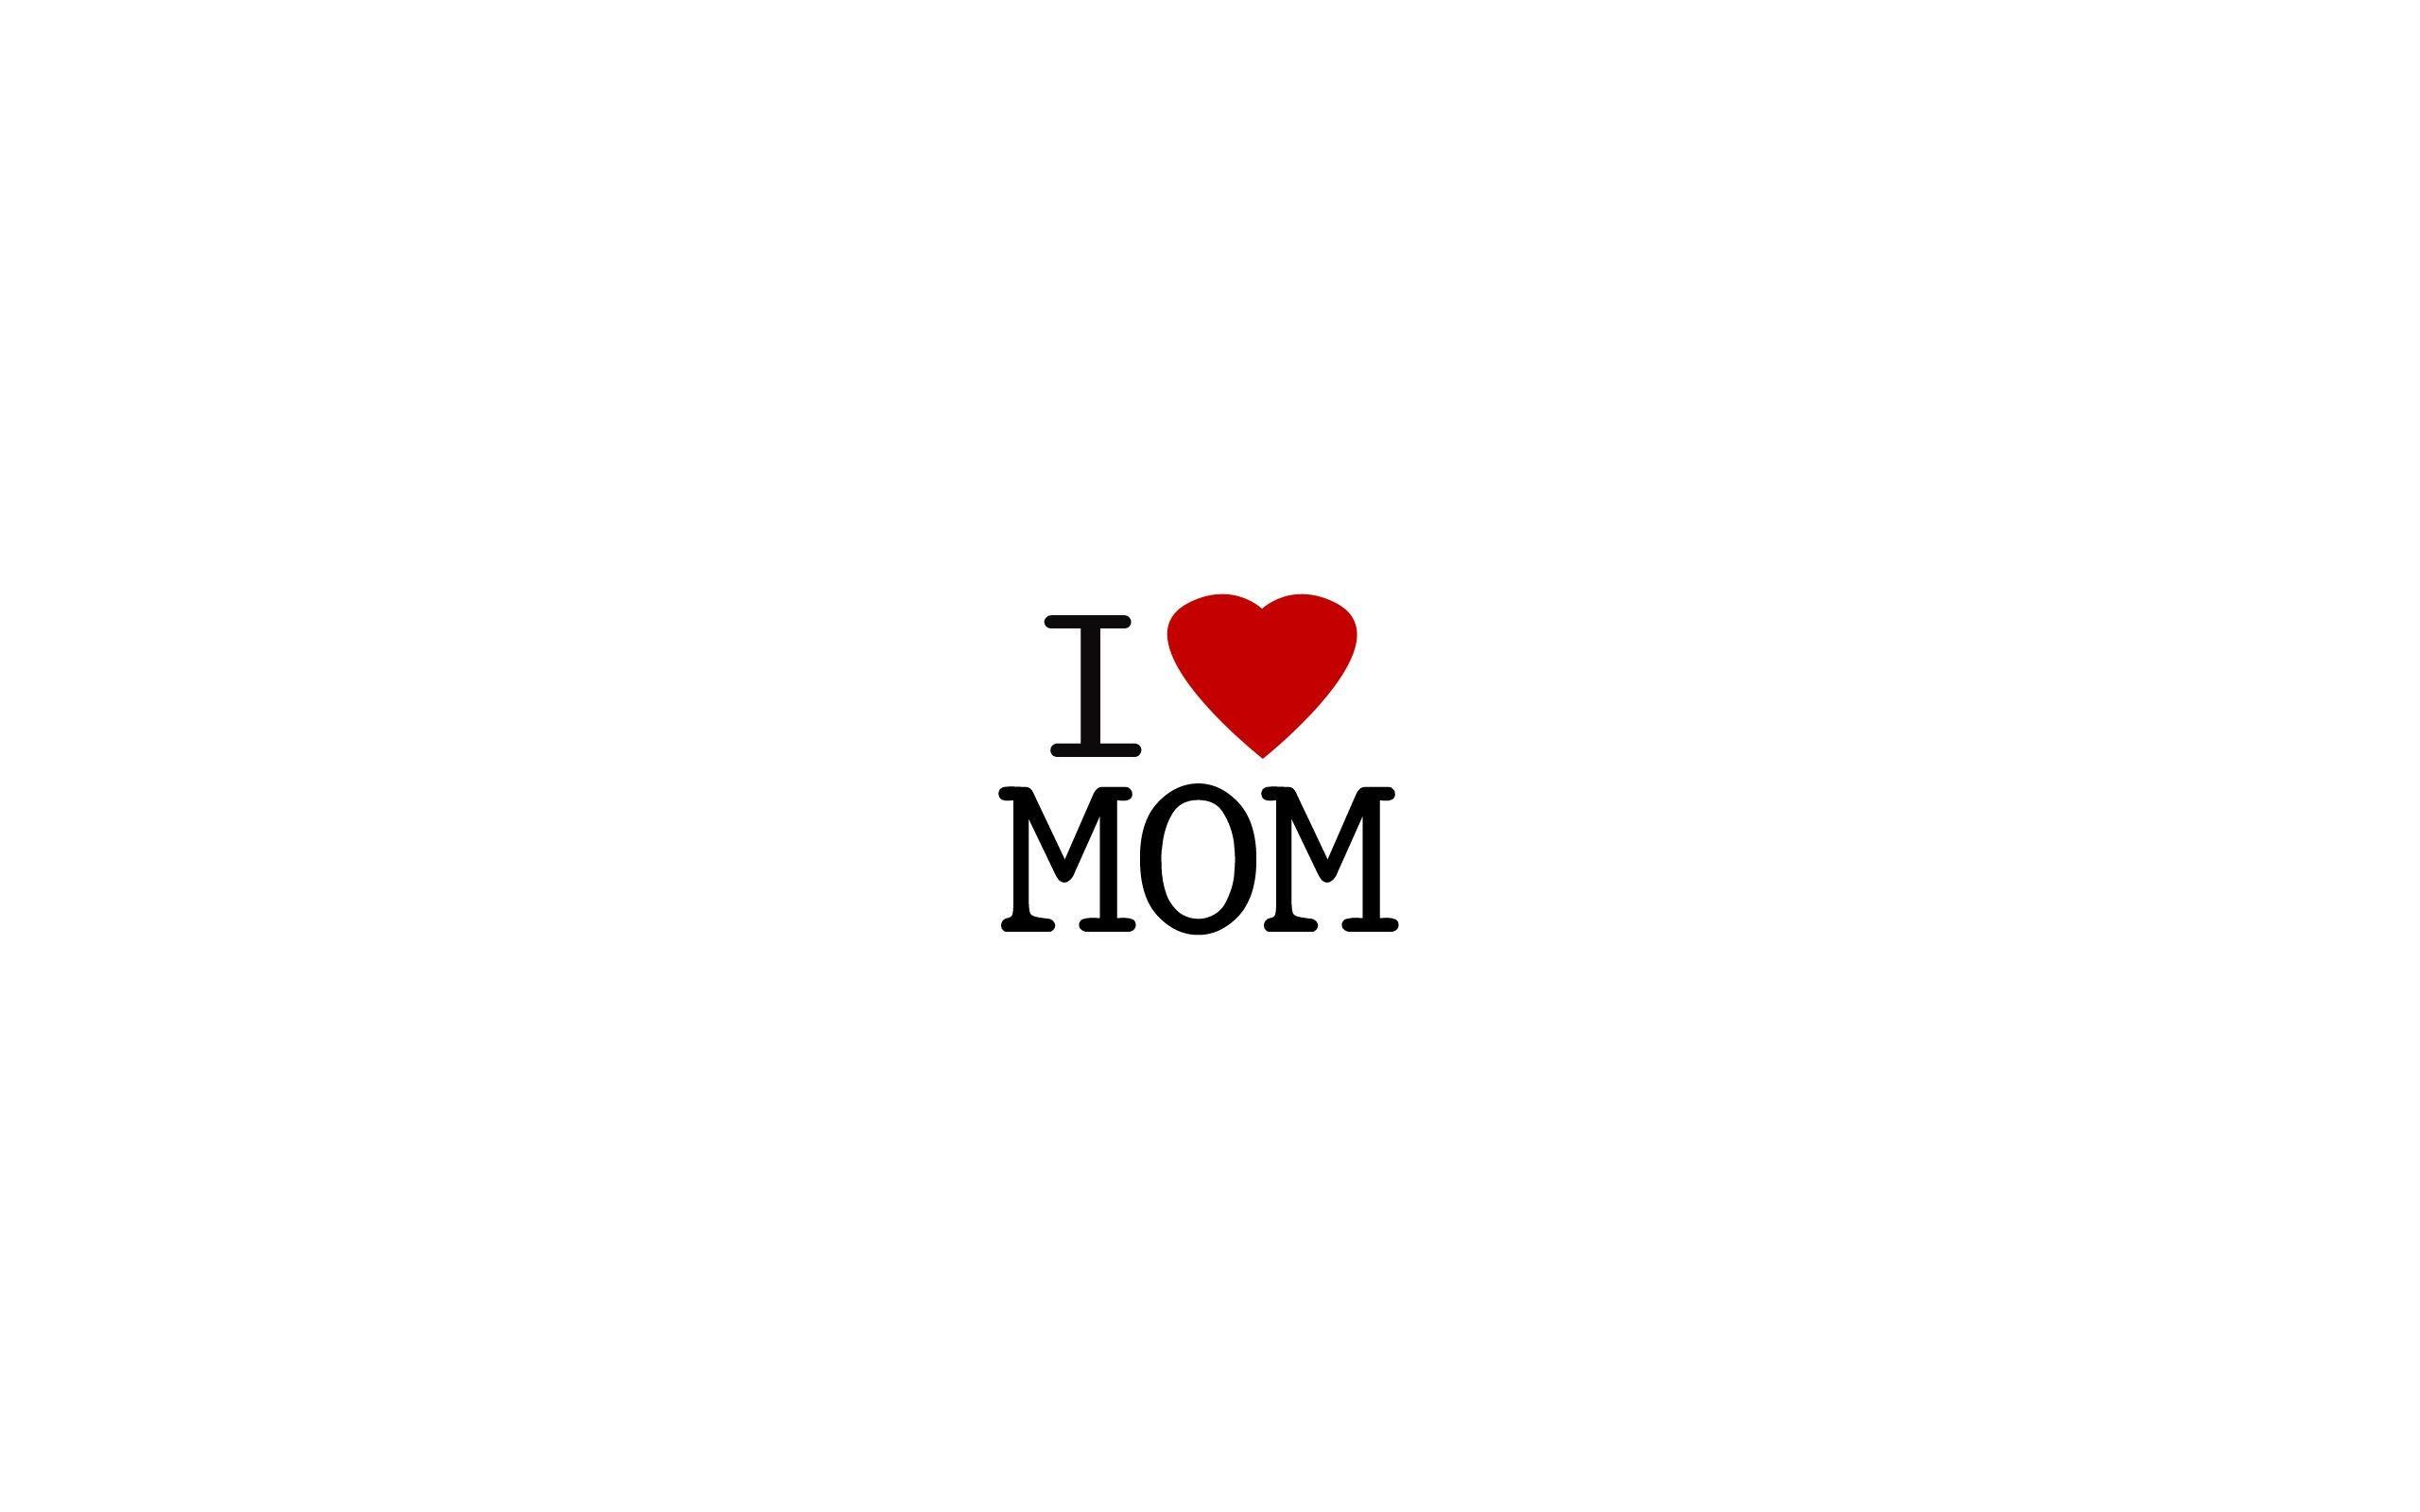 … i love you mom wallpapers hd pixelstalk net …